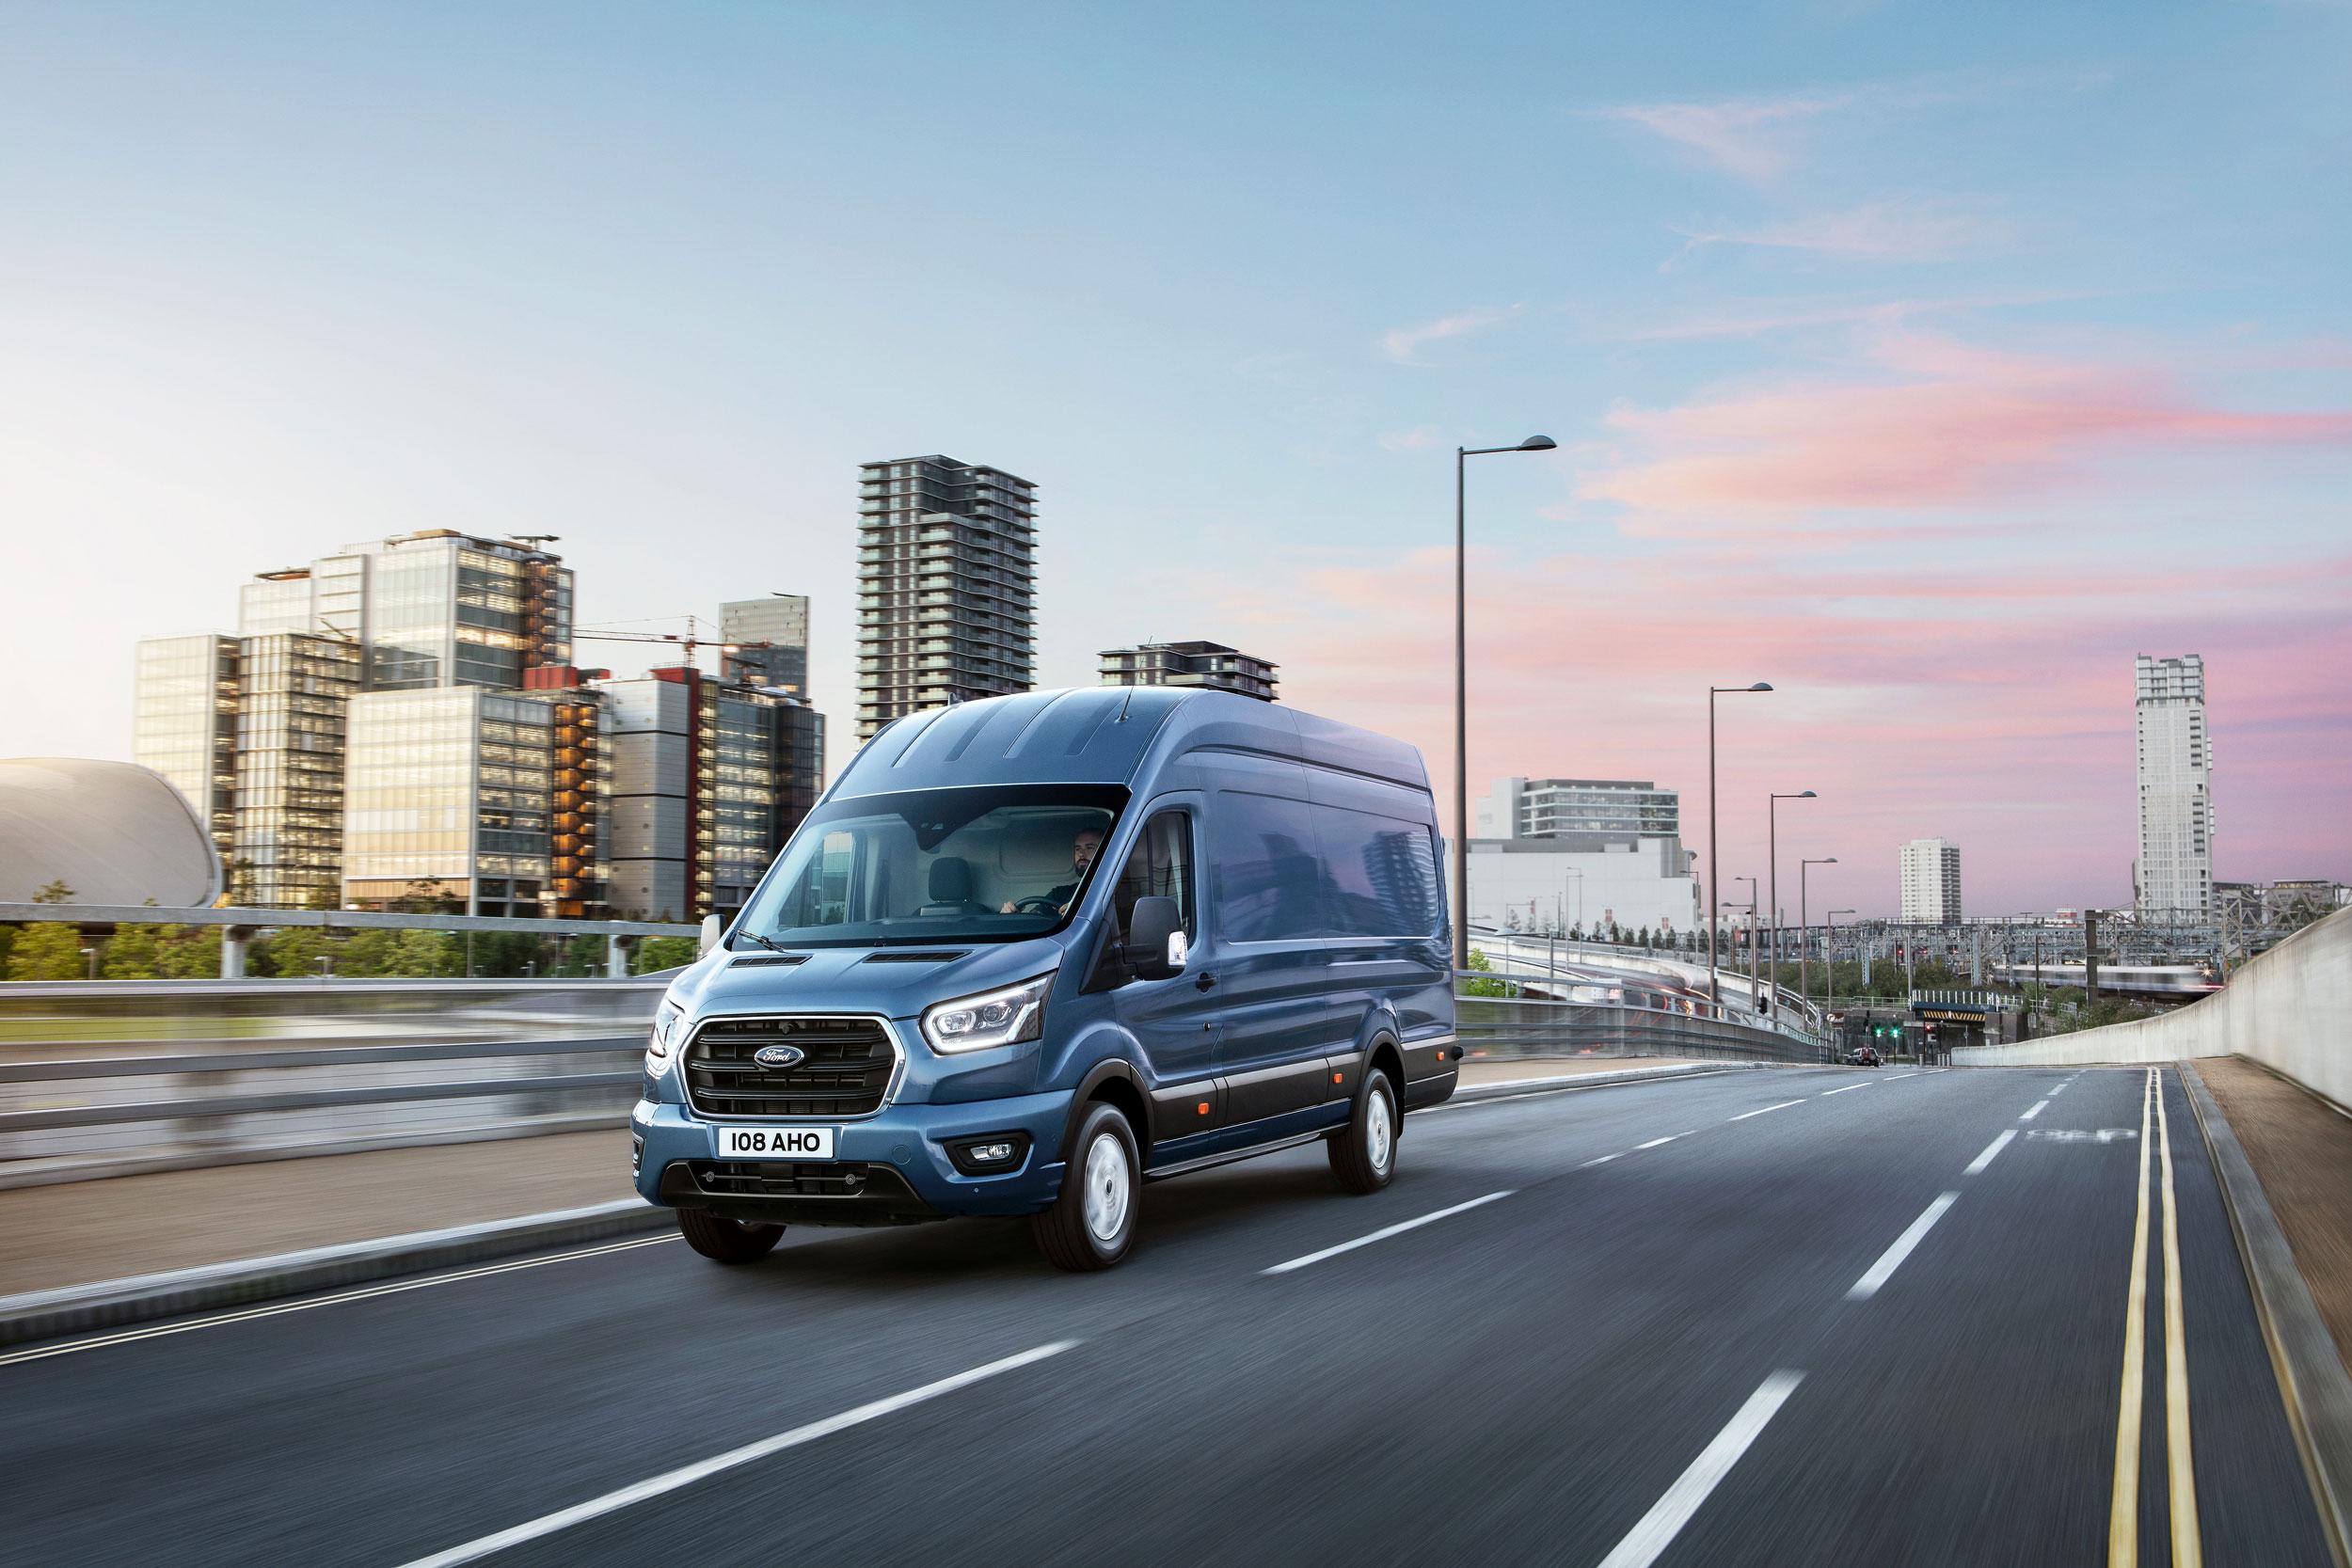 2018 Ford Transit driving